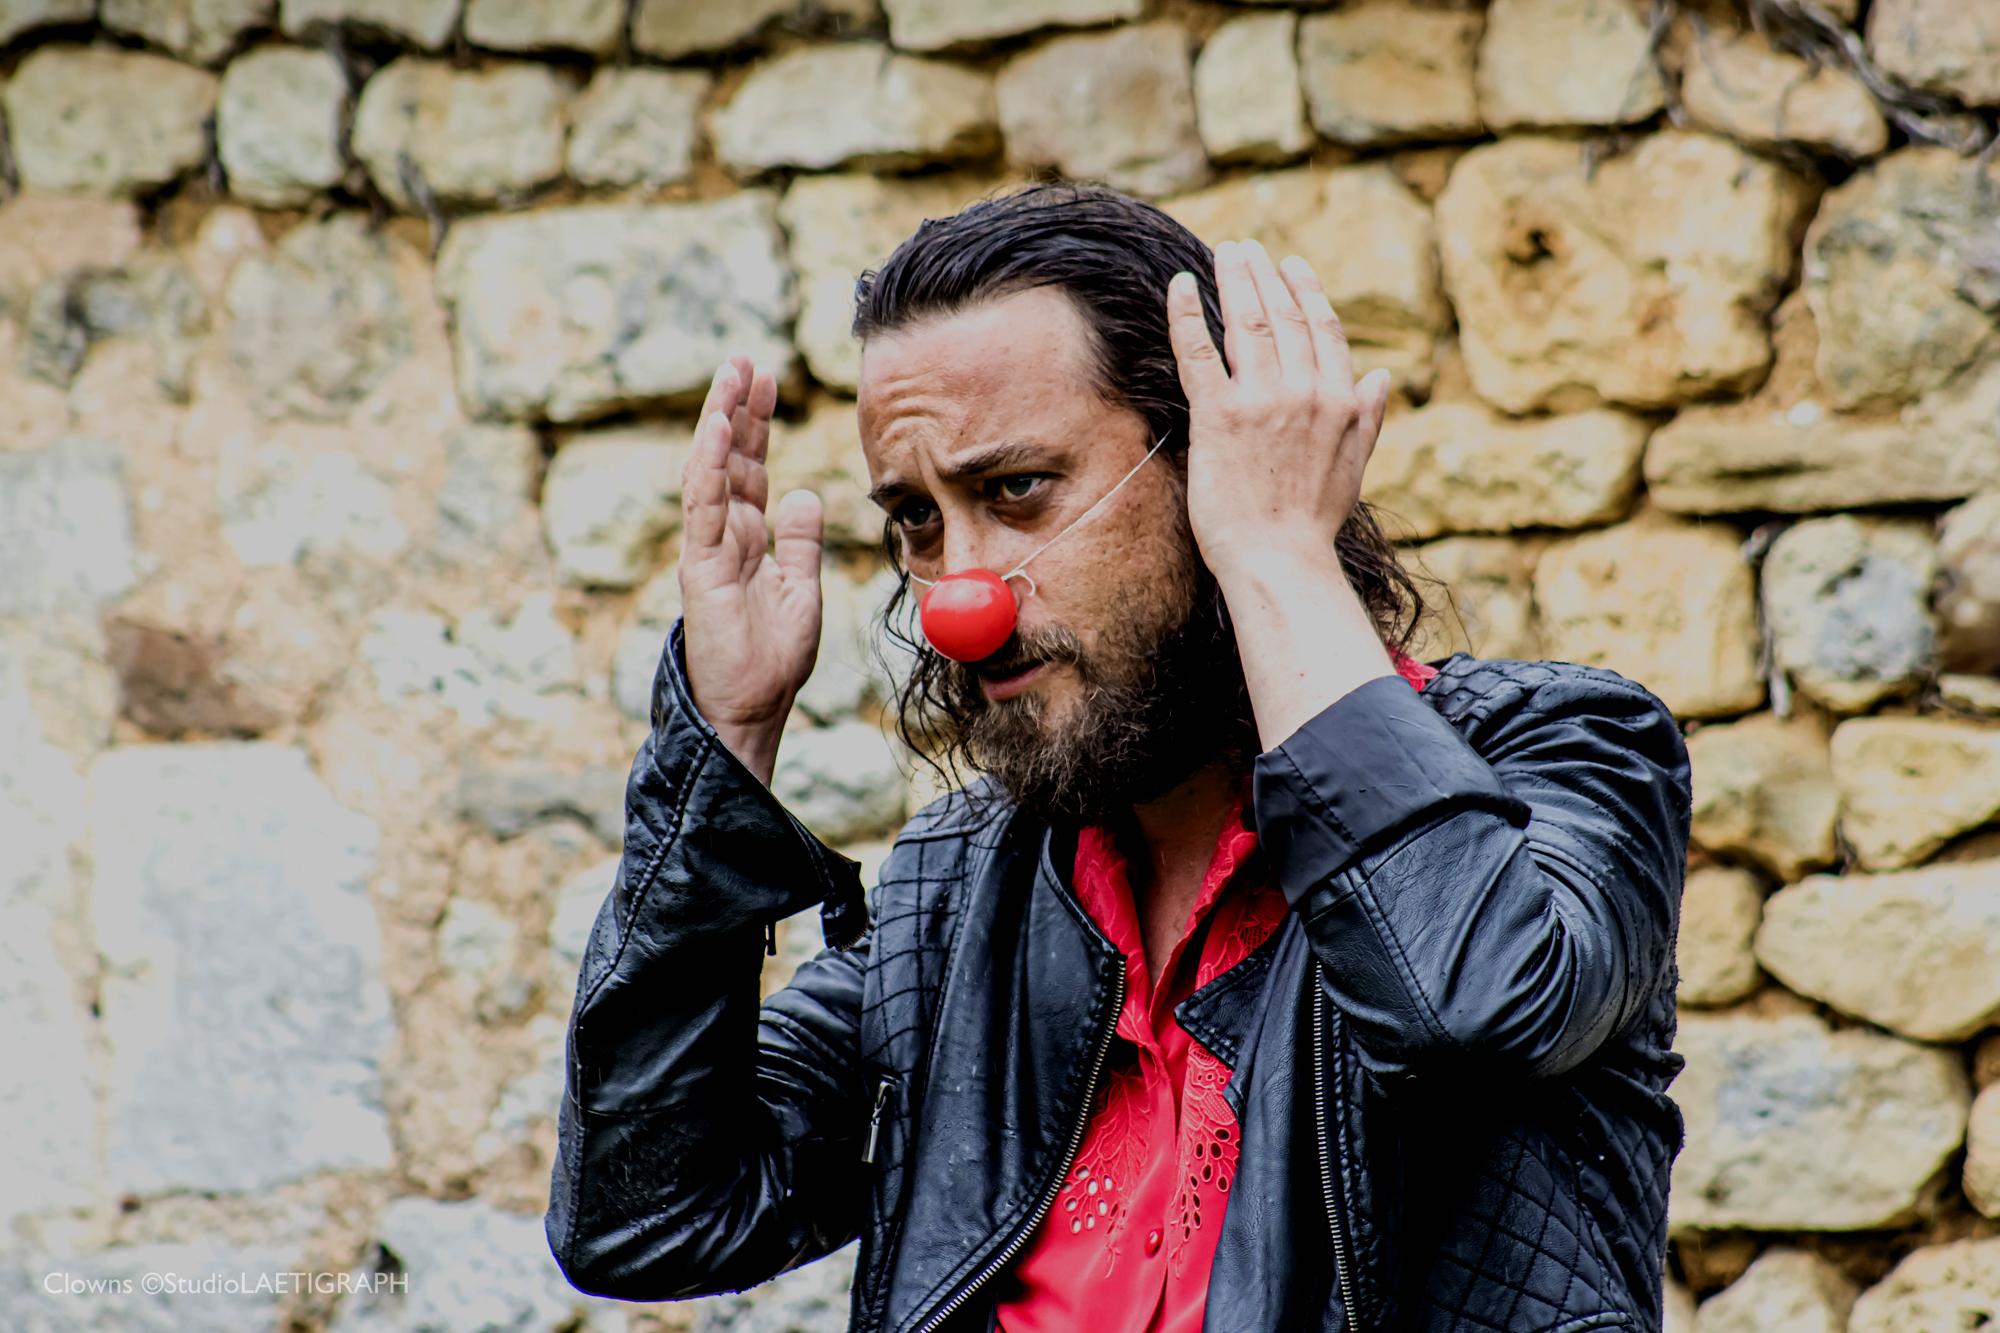 LMDCB21_clowns-55_1